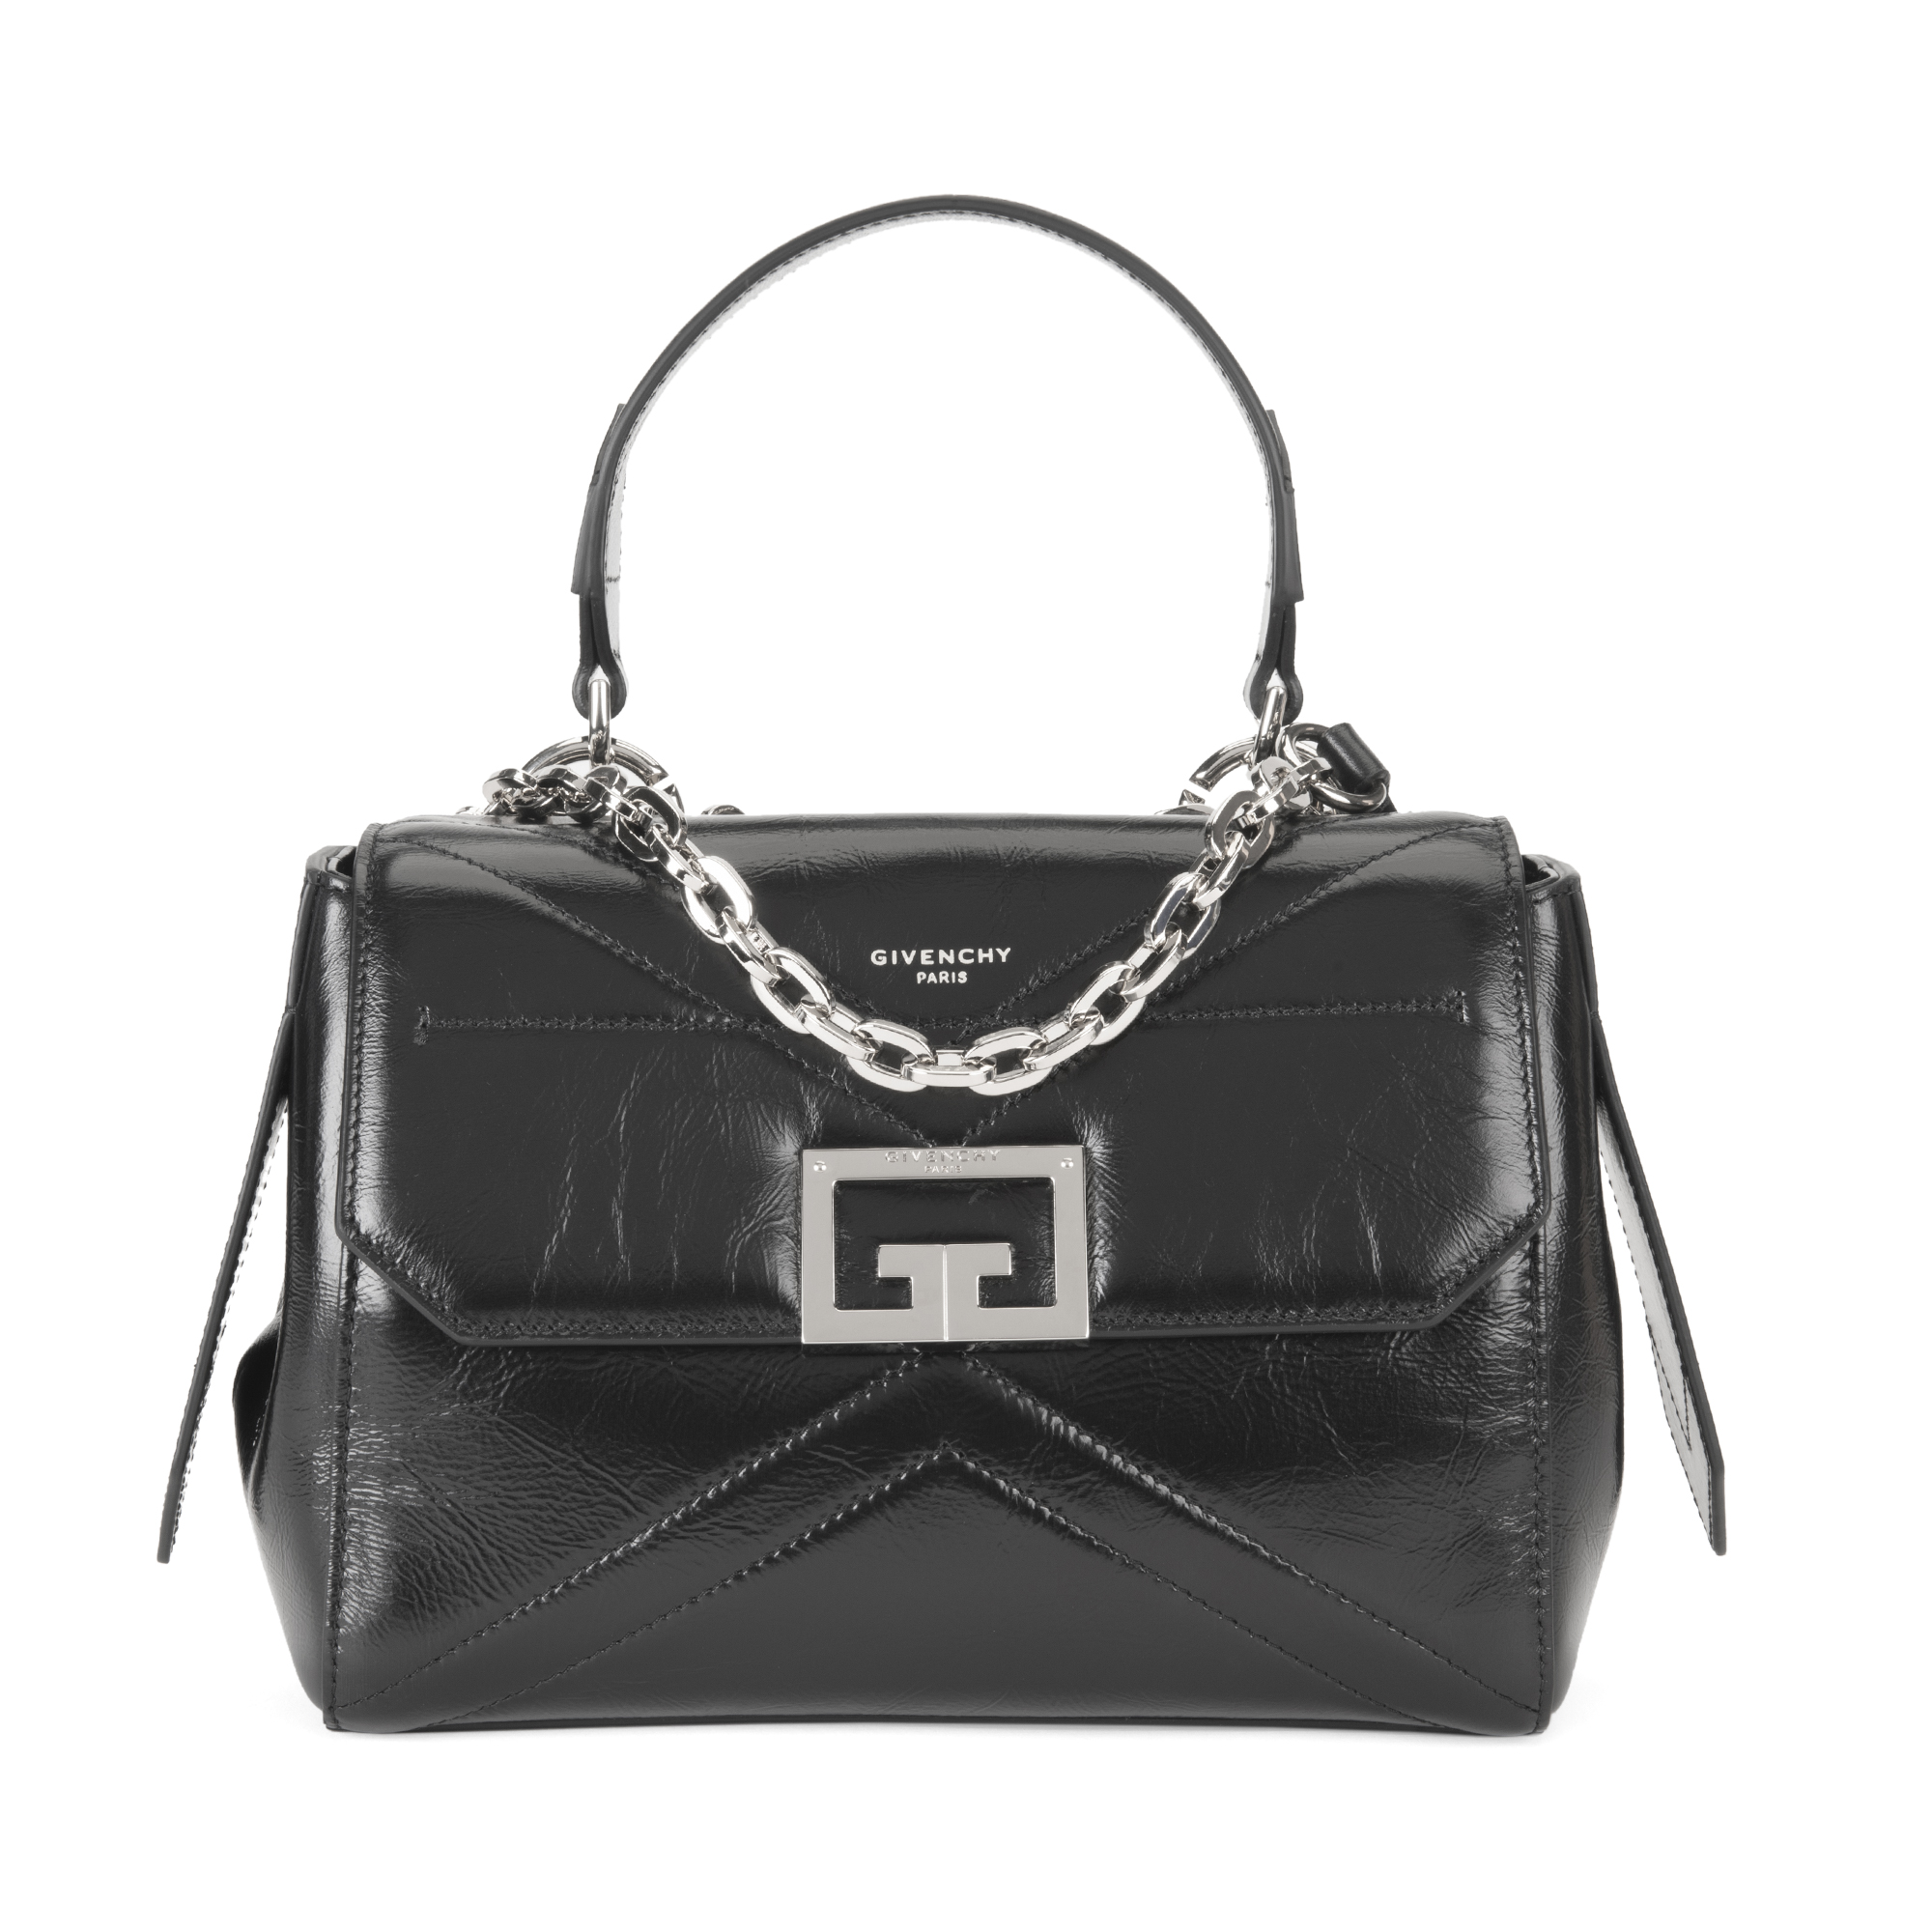 1522844-02 Givenchy